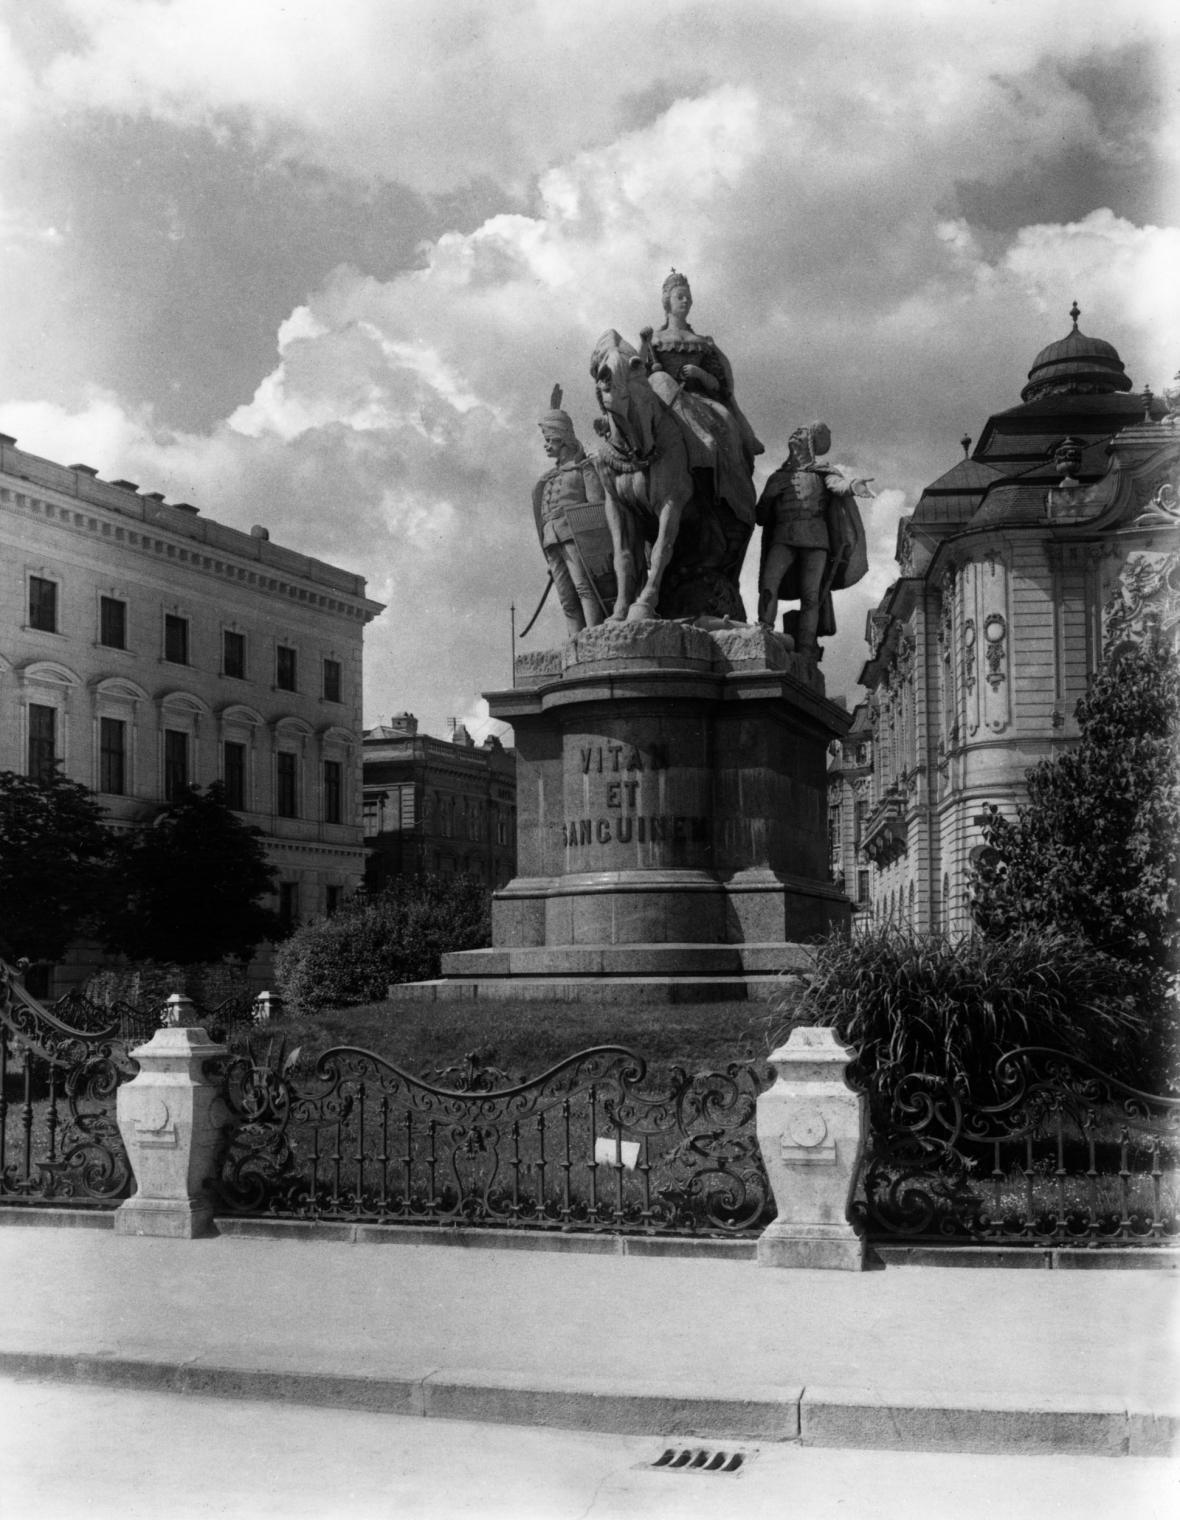 Bratislavský pomník Marie Terezie